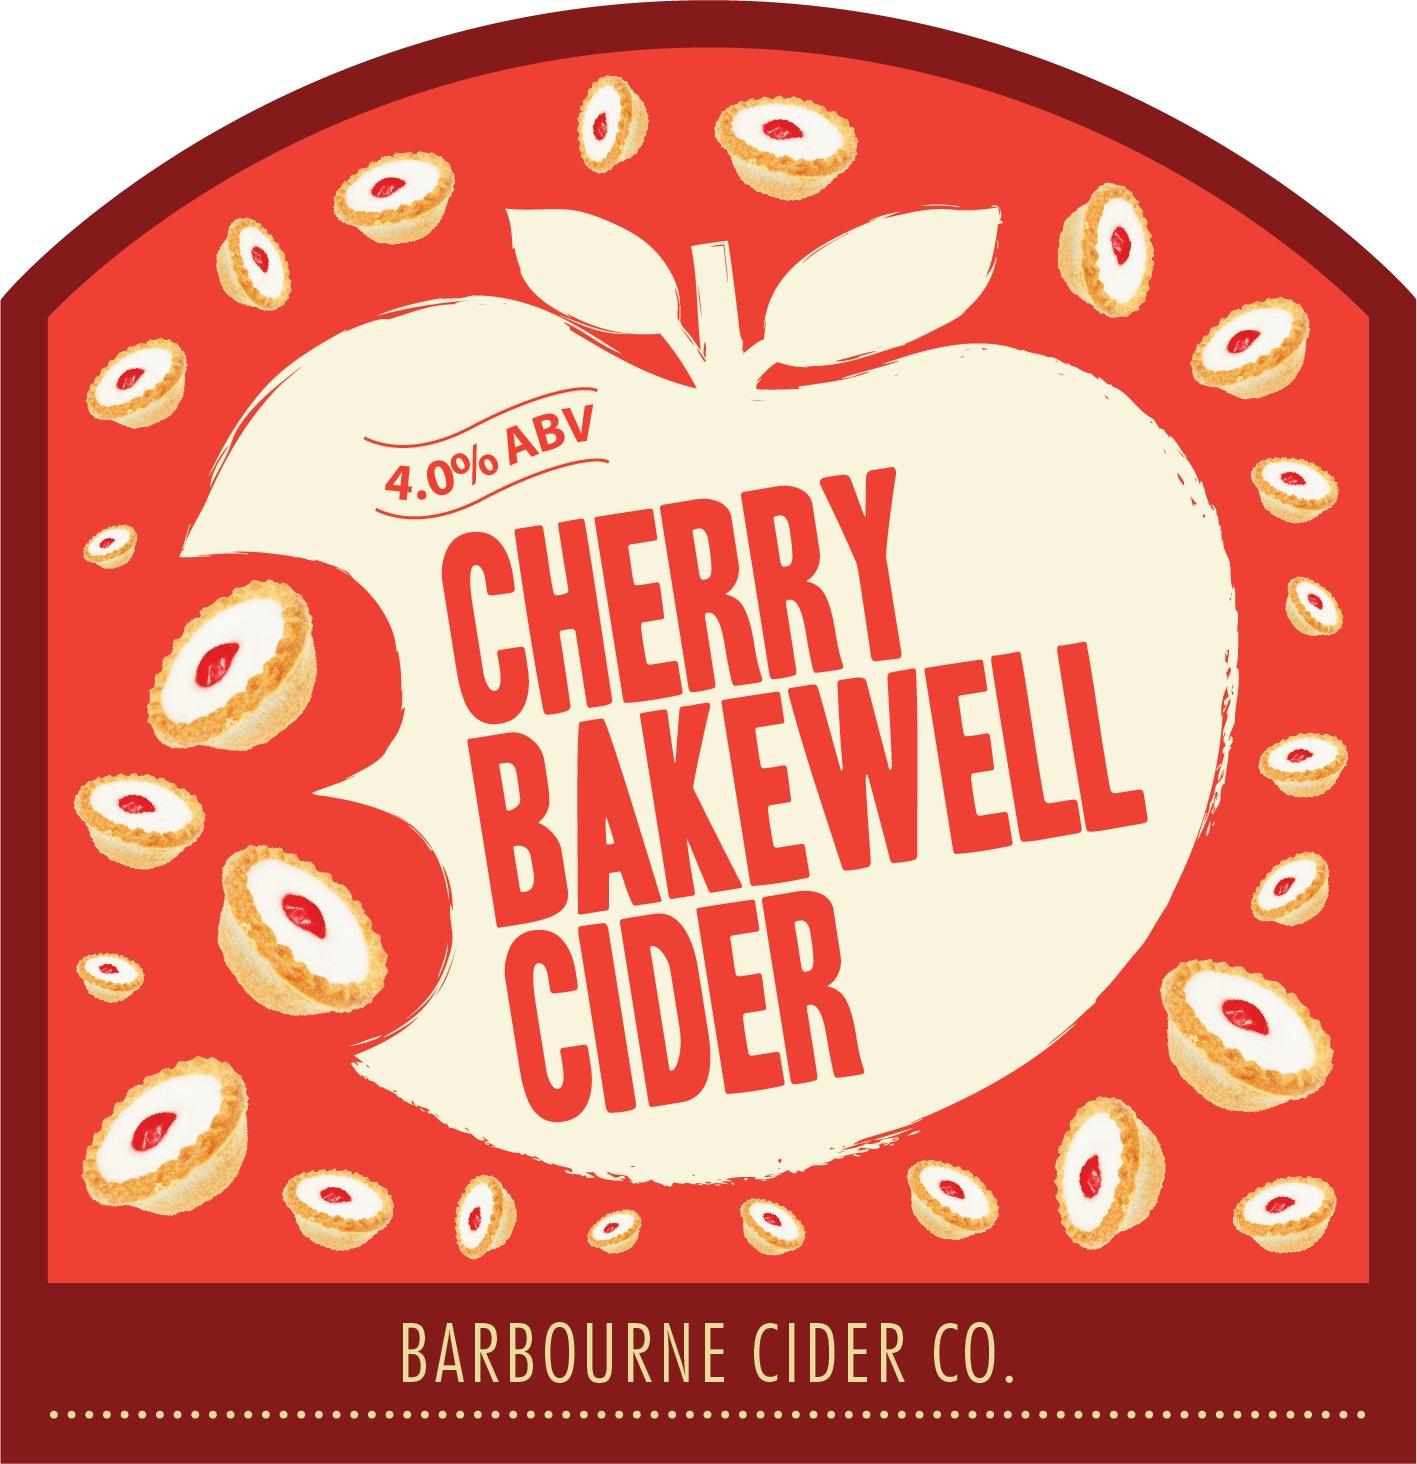 Barbourne Cherry Bakewell Cider 20Ltr Bib Med- Sweet 4.0%